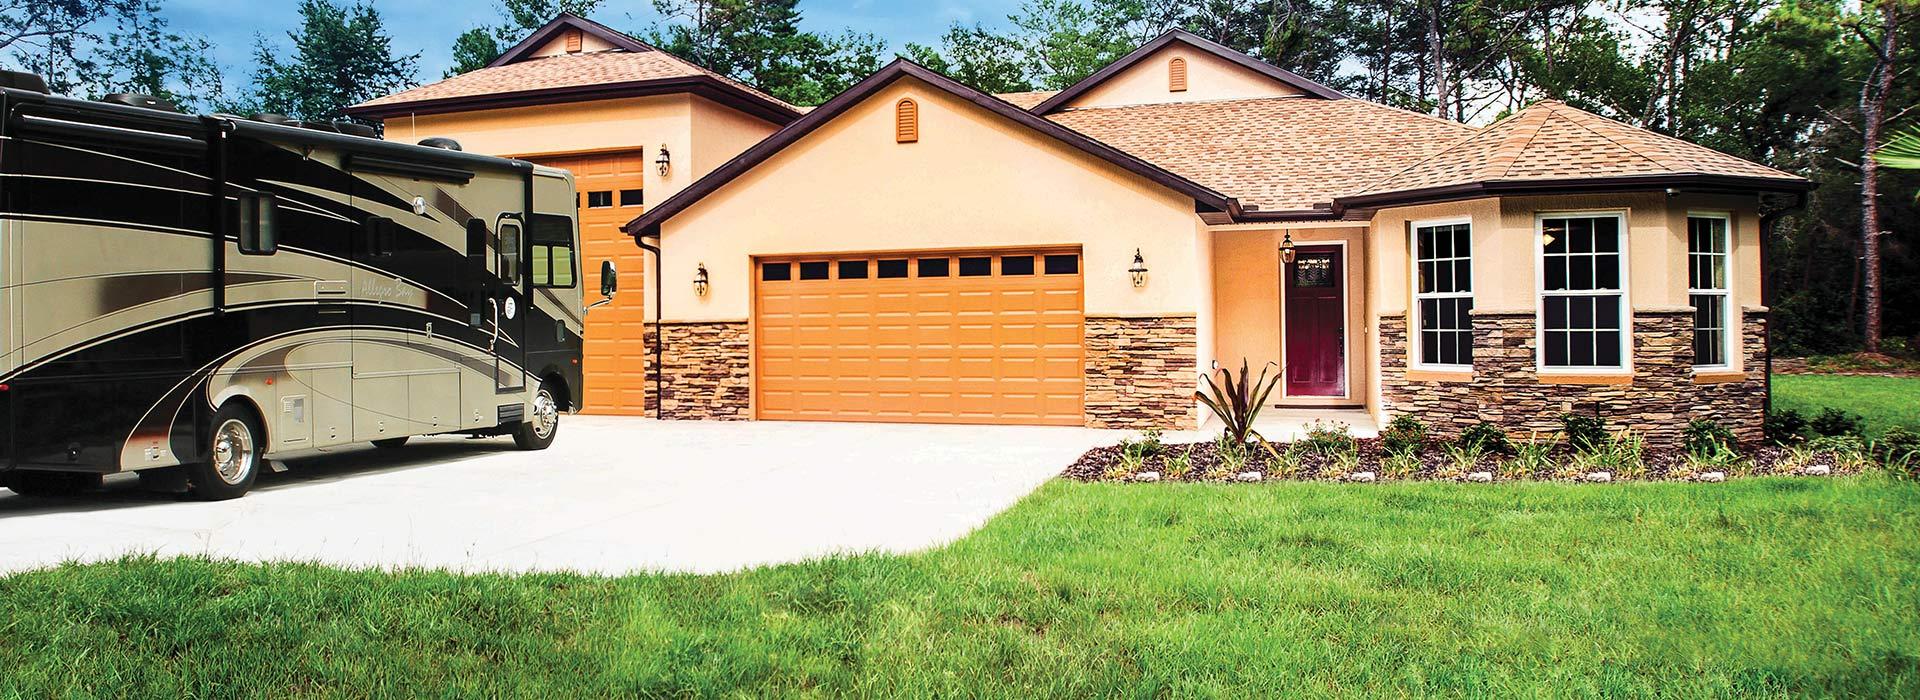 Real Estate Lake Weir Lake County Lady Lake Central Florida Fl